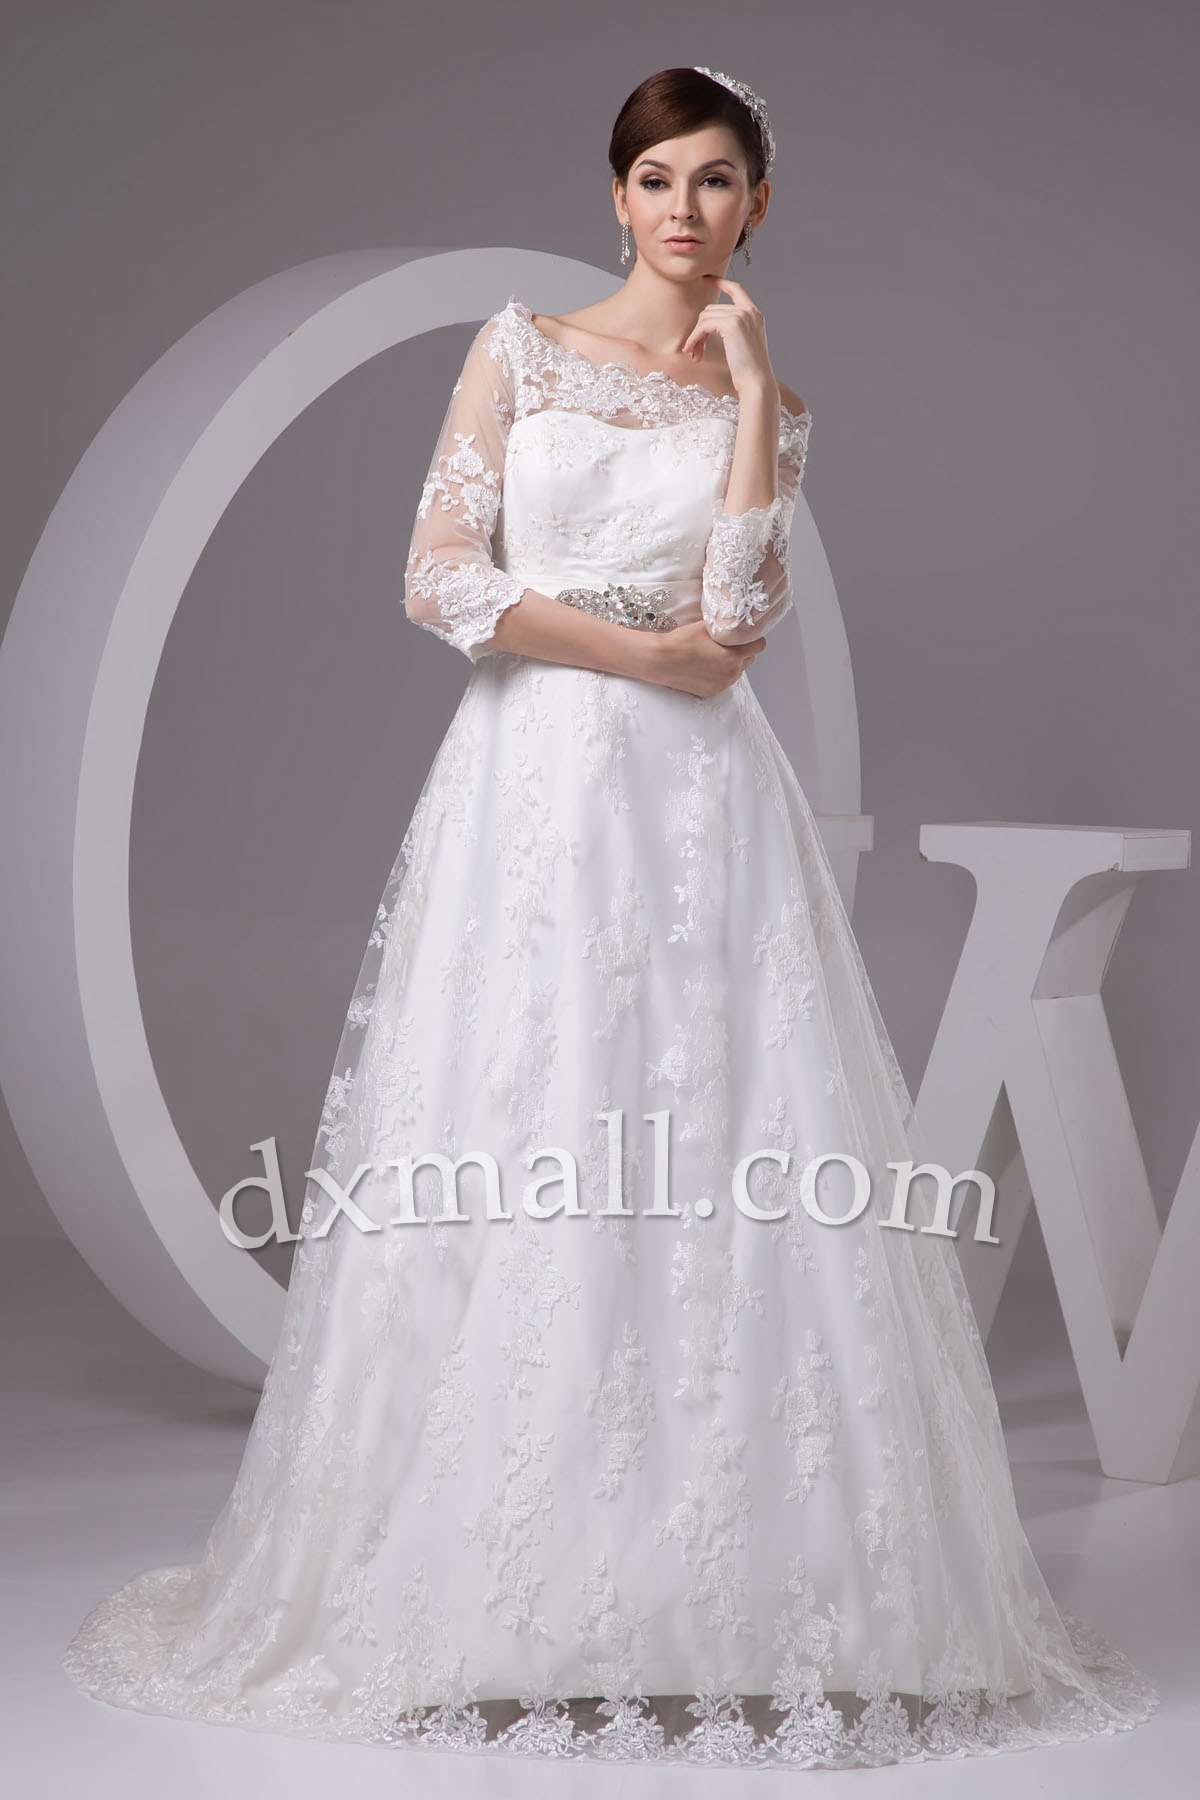 Aline wedding dresses bateau court train lace satin ivory